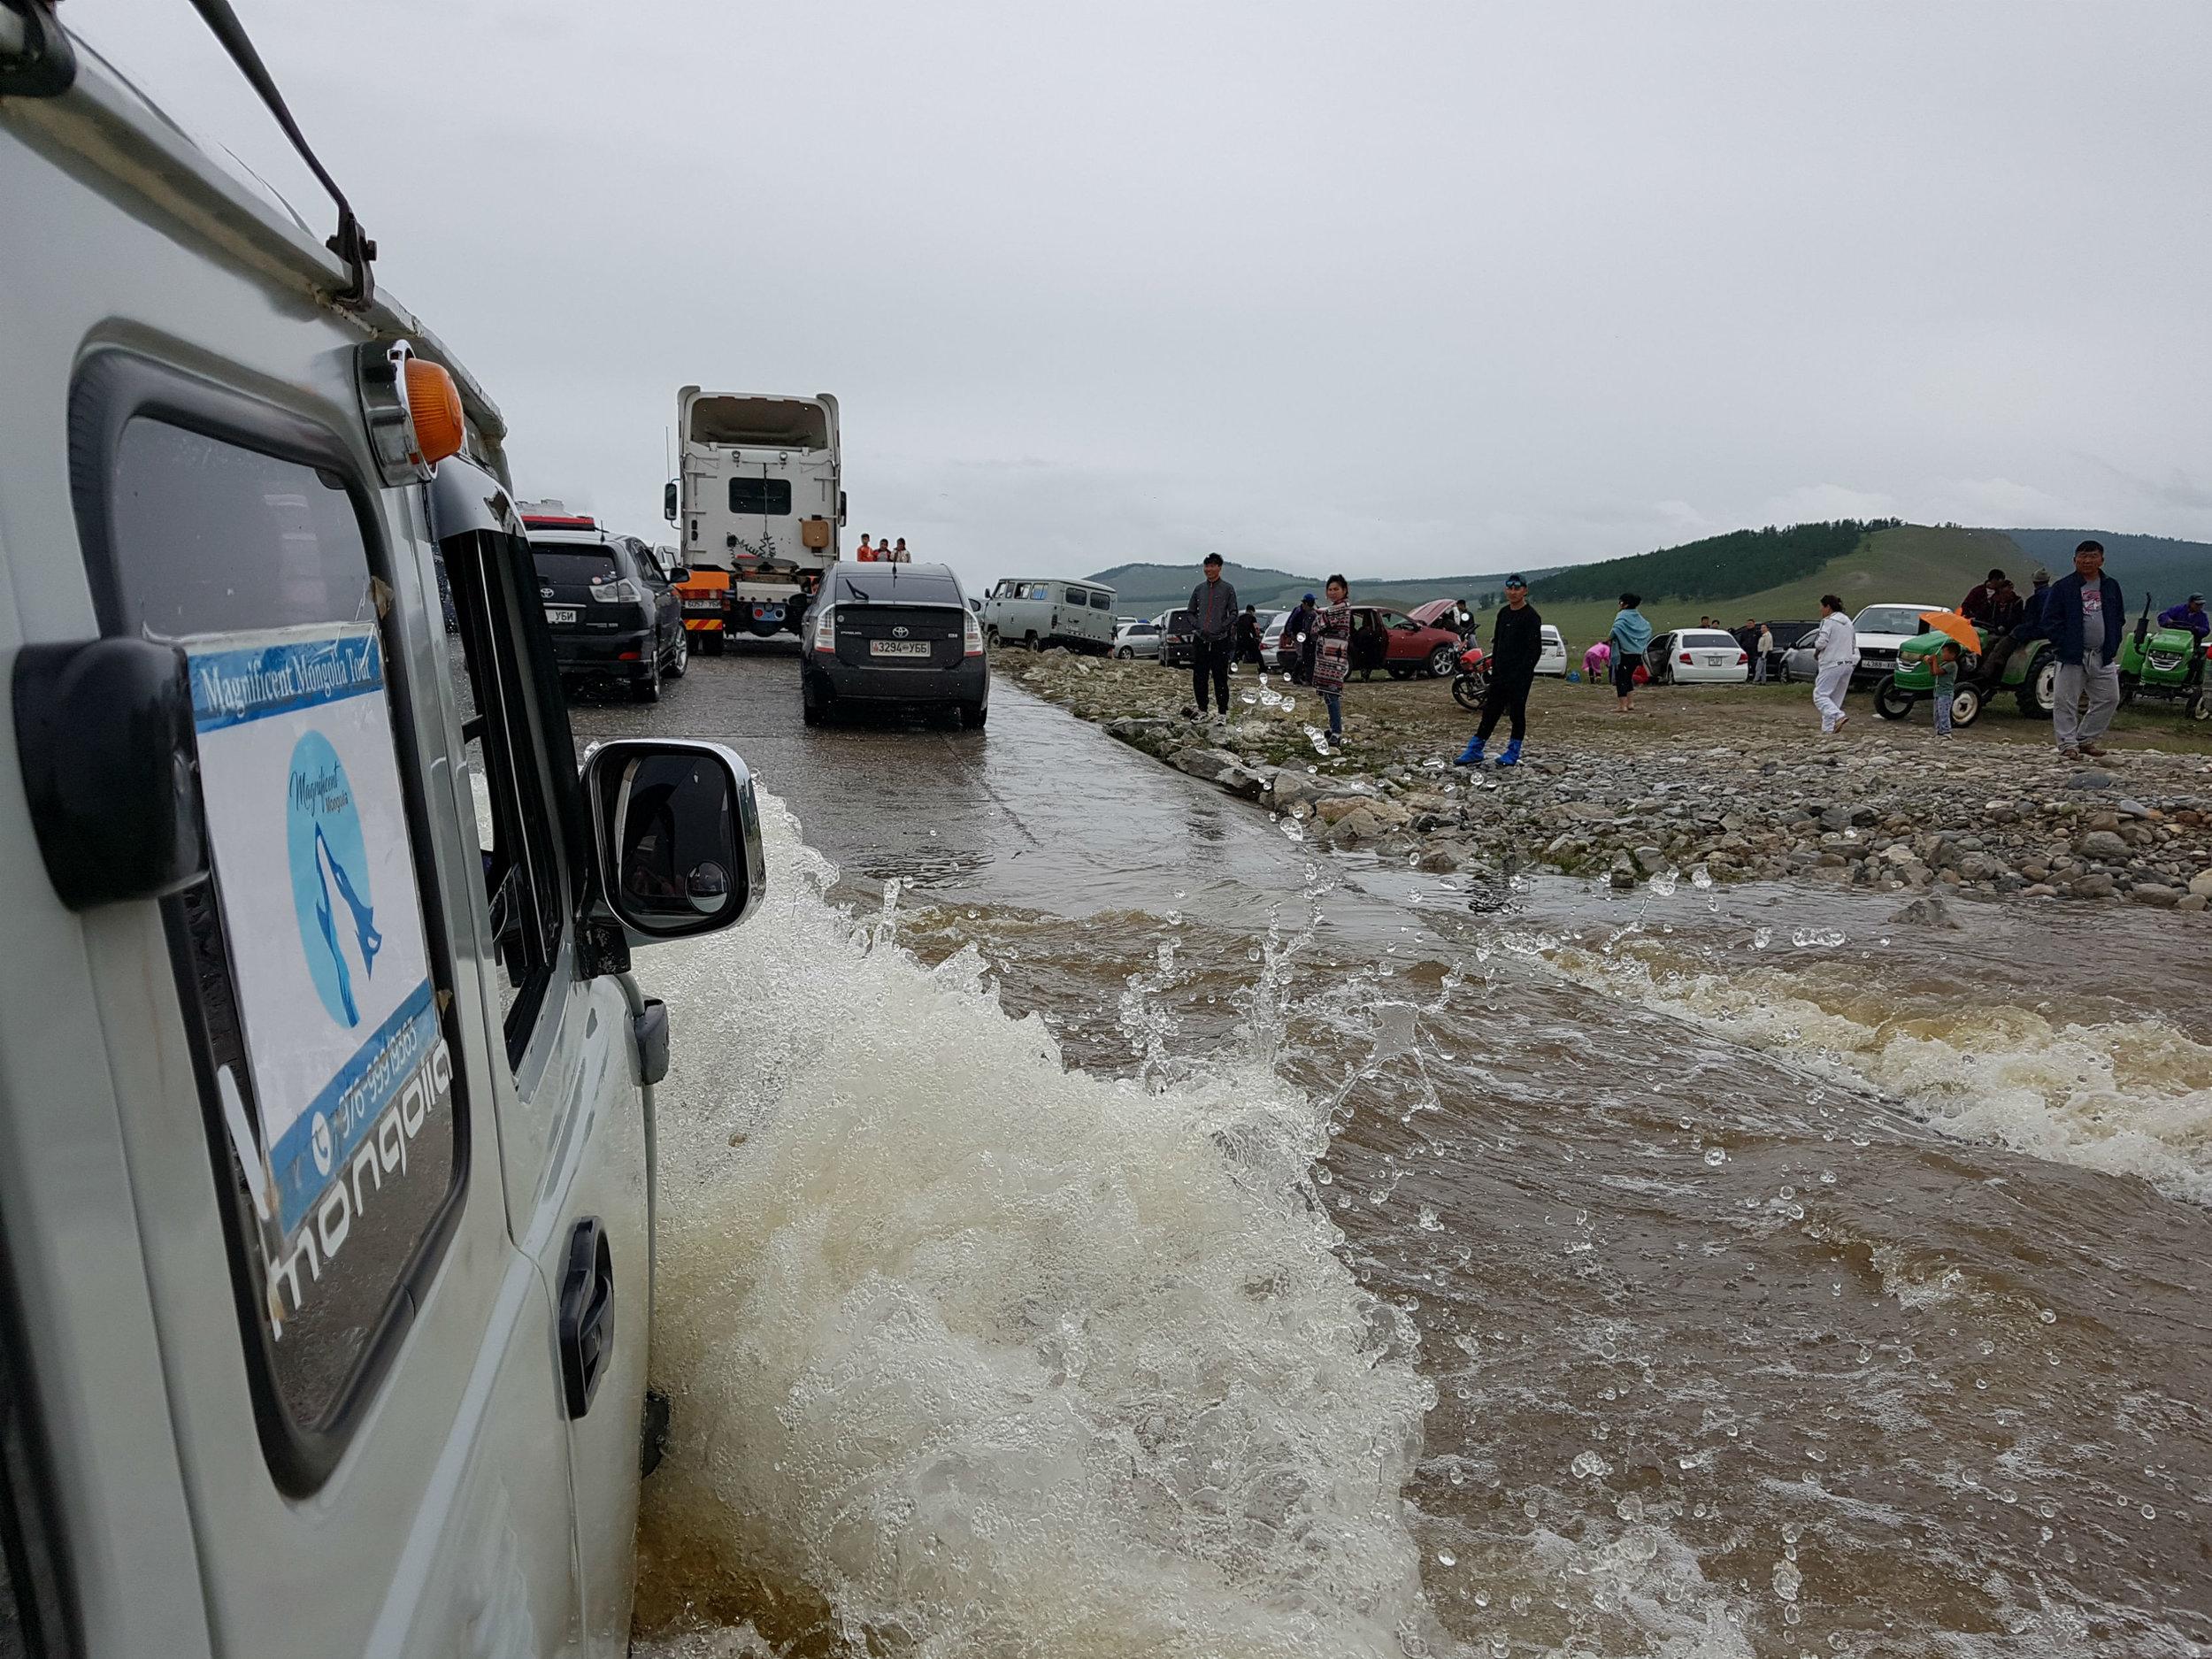 Crossing flooded river crossings was dangerous